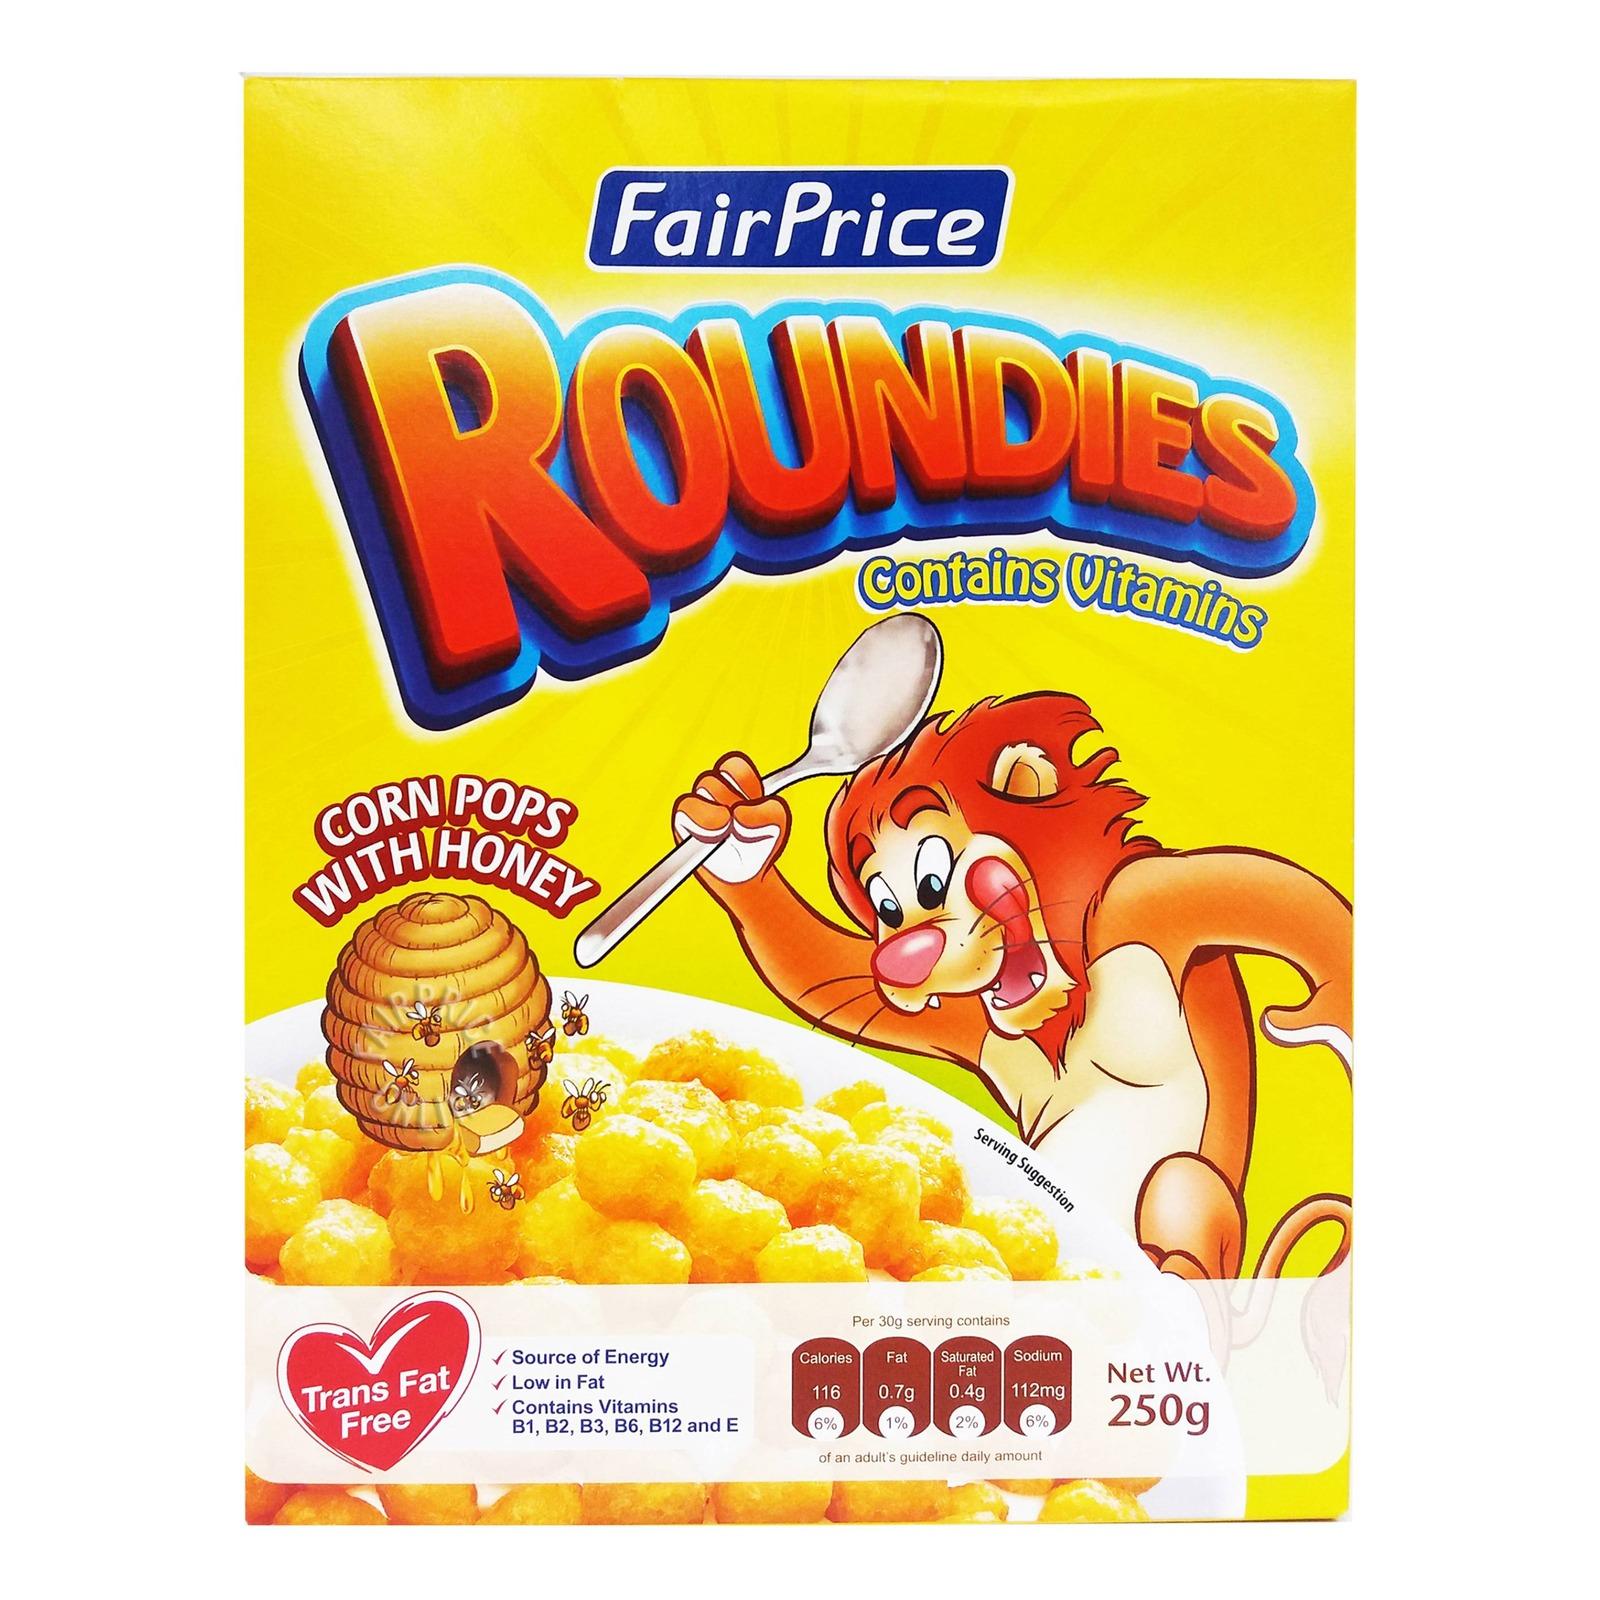 FairPrice Cereals - Roundies (Corn Pops with Honey)